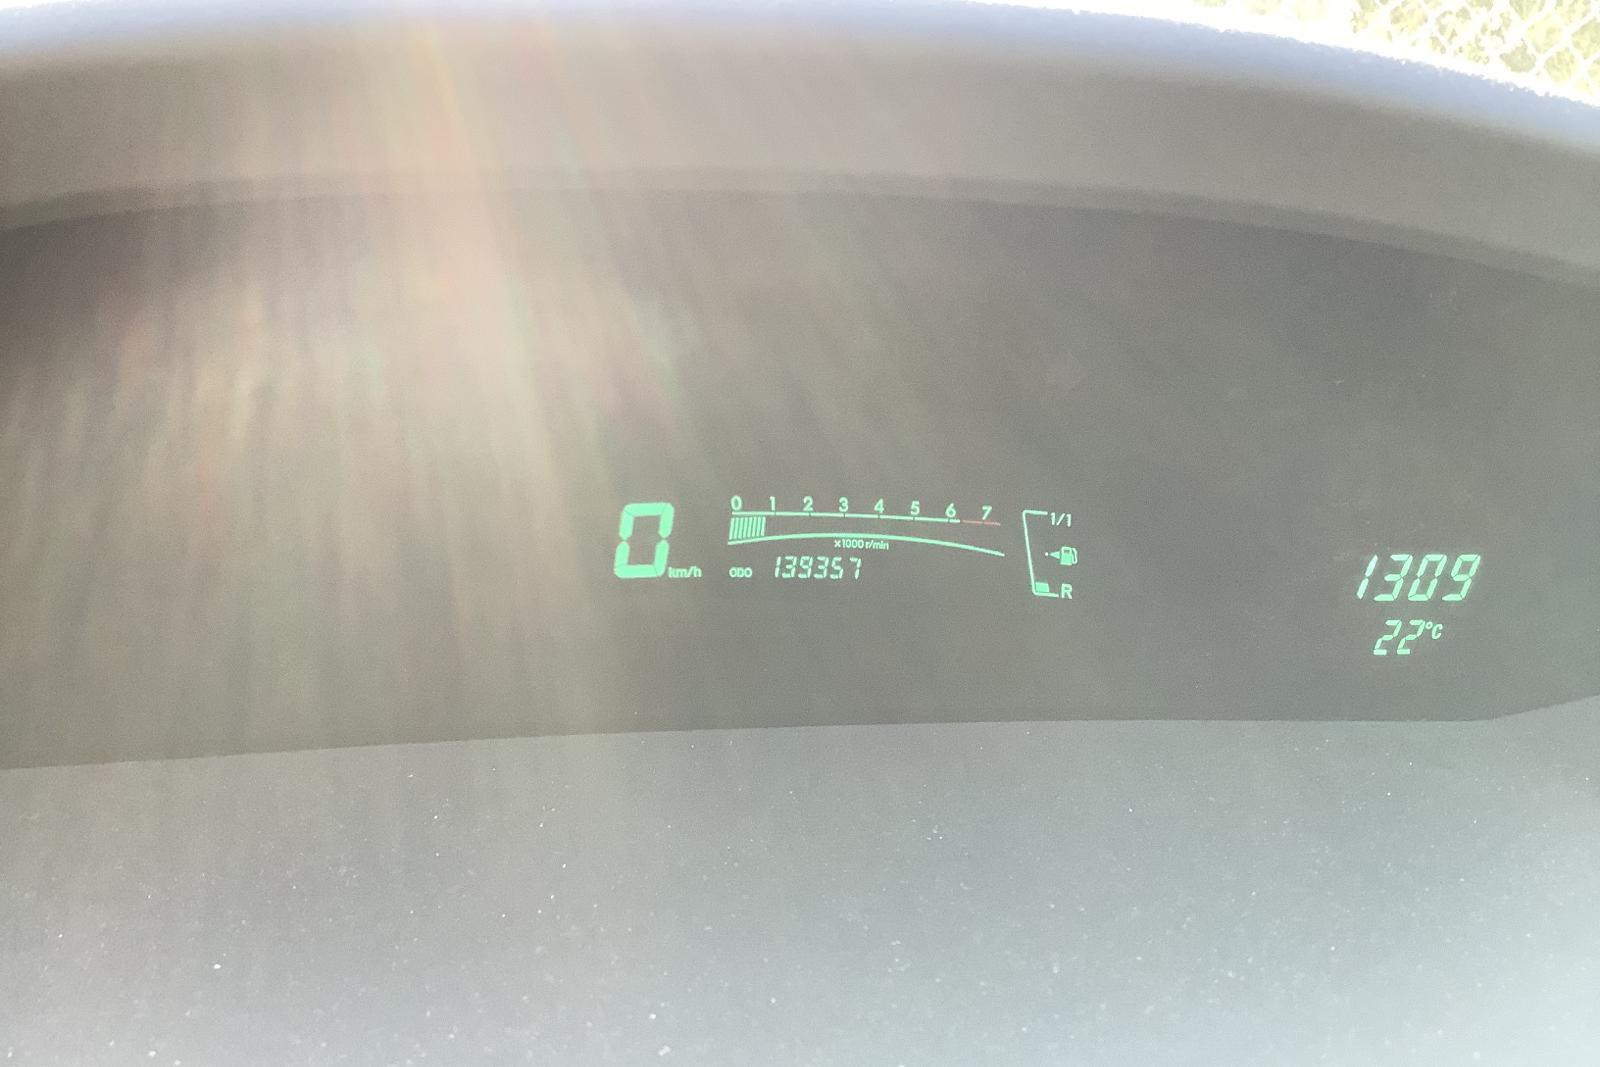 Toyota Yaris 1.3 5dr (87hk) - 140 000 km - Manual - black - 2007